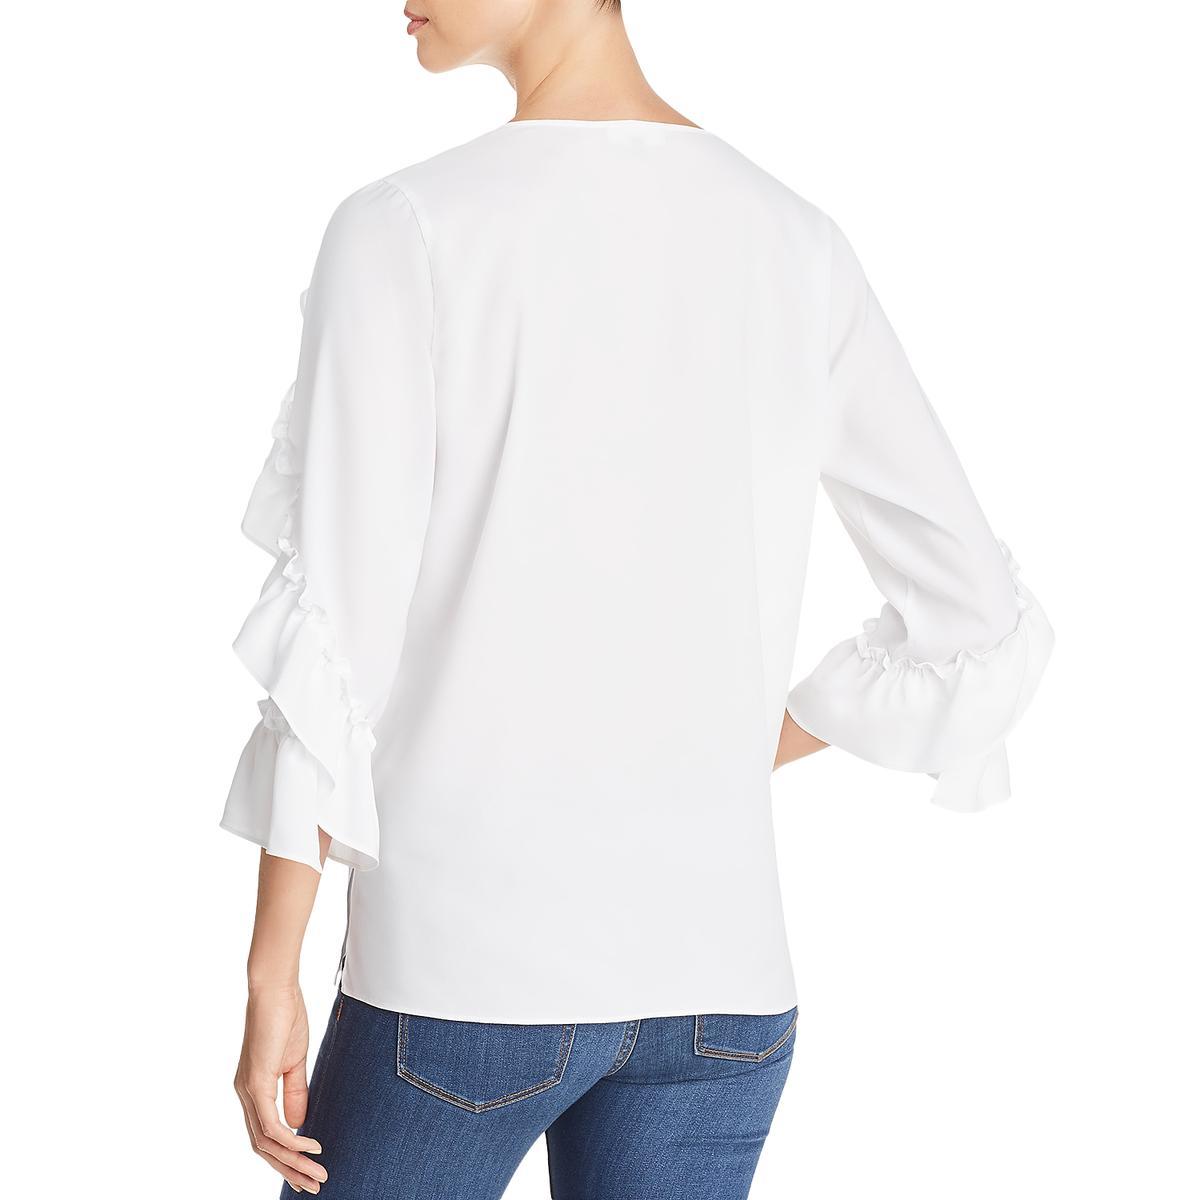 Le Gali Womens Kaylen Ruffled 3//4 Sleeves V-Neck Blouse Top BHFO 8394